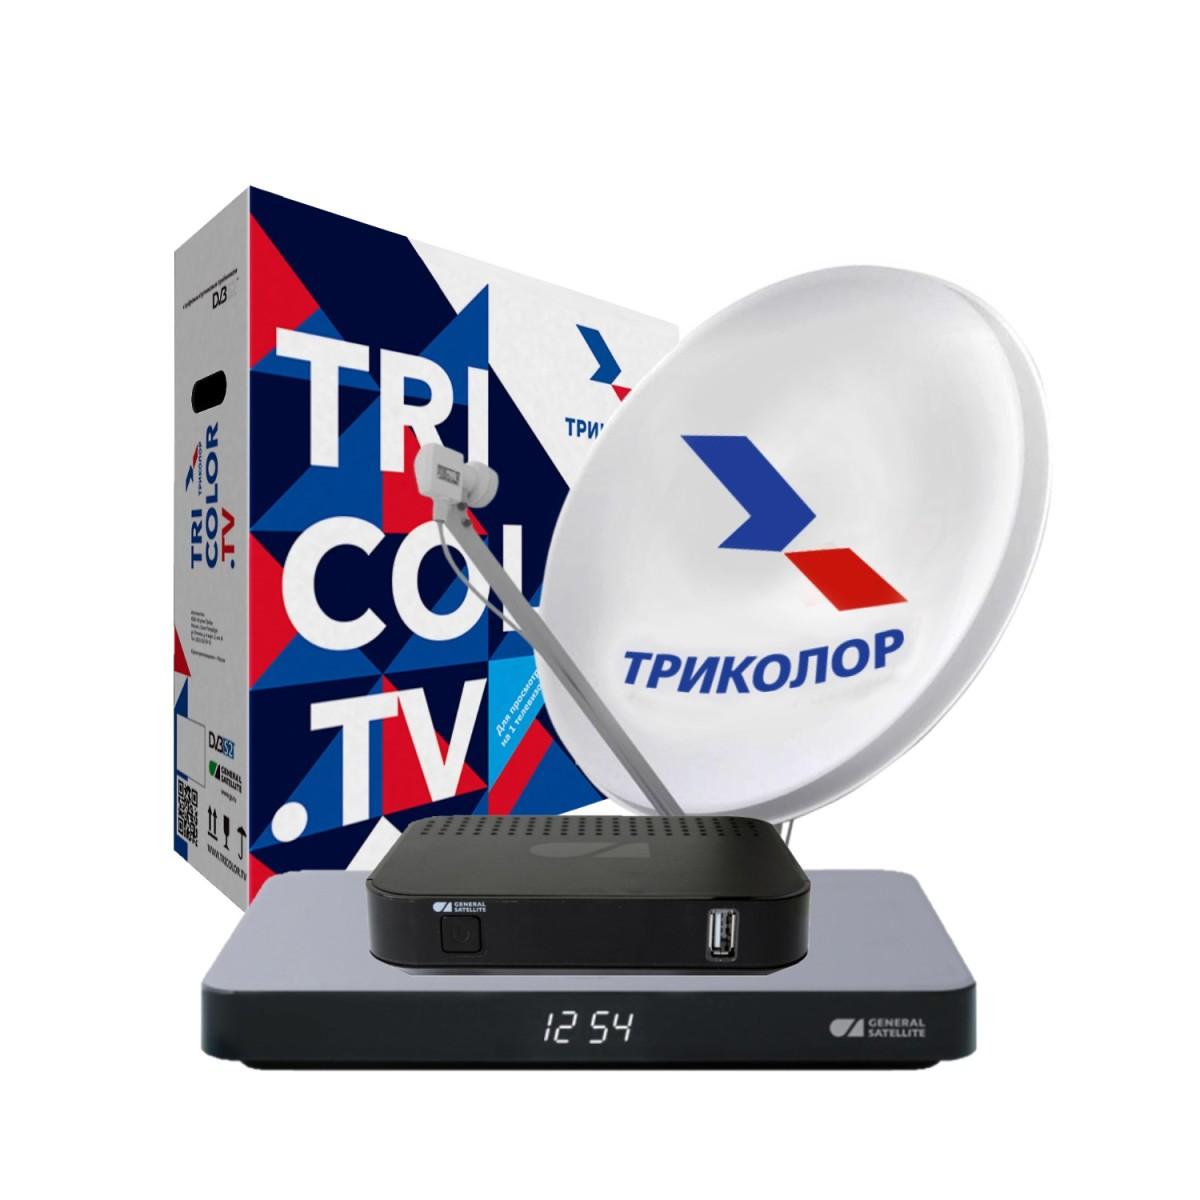 Комплект спутникового телевидения Триколор ТВ Ultra HD GS B621L и GS C592